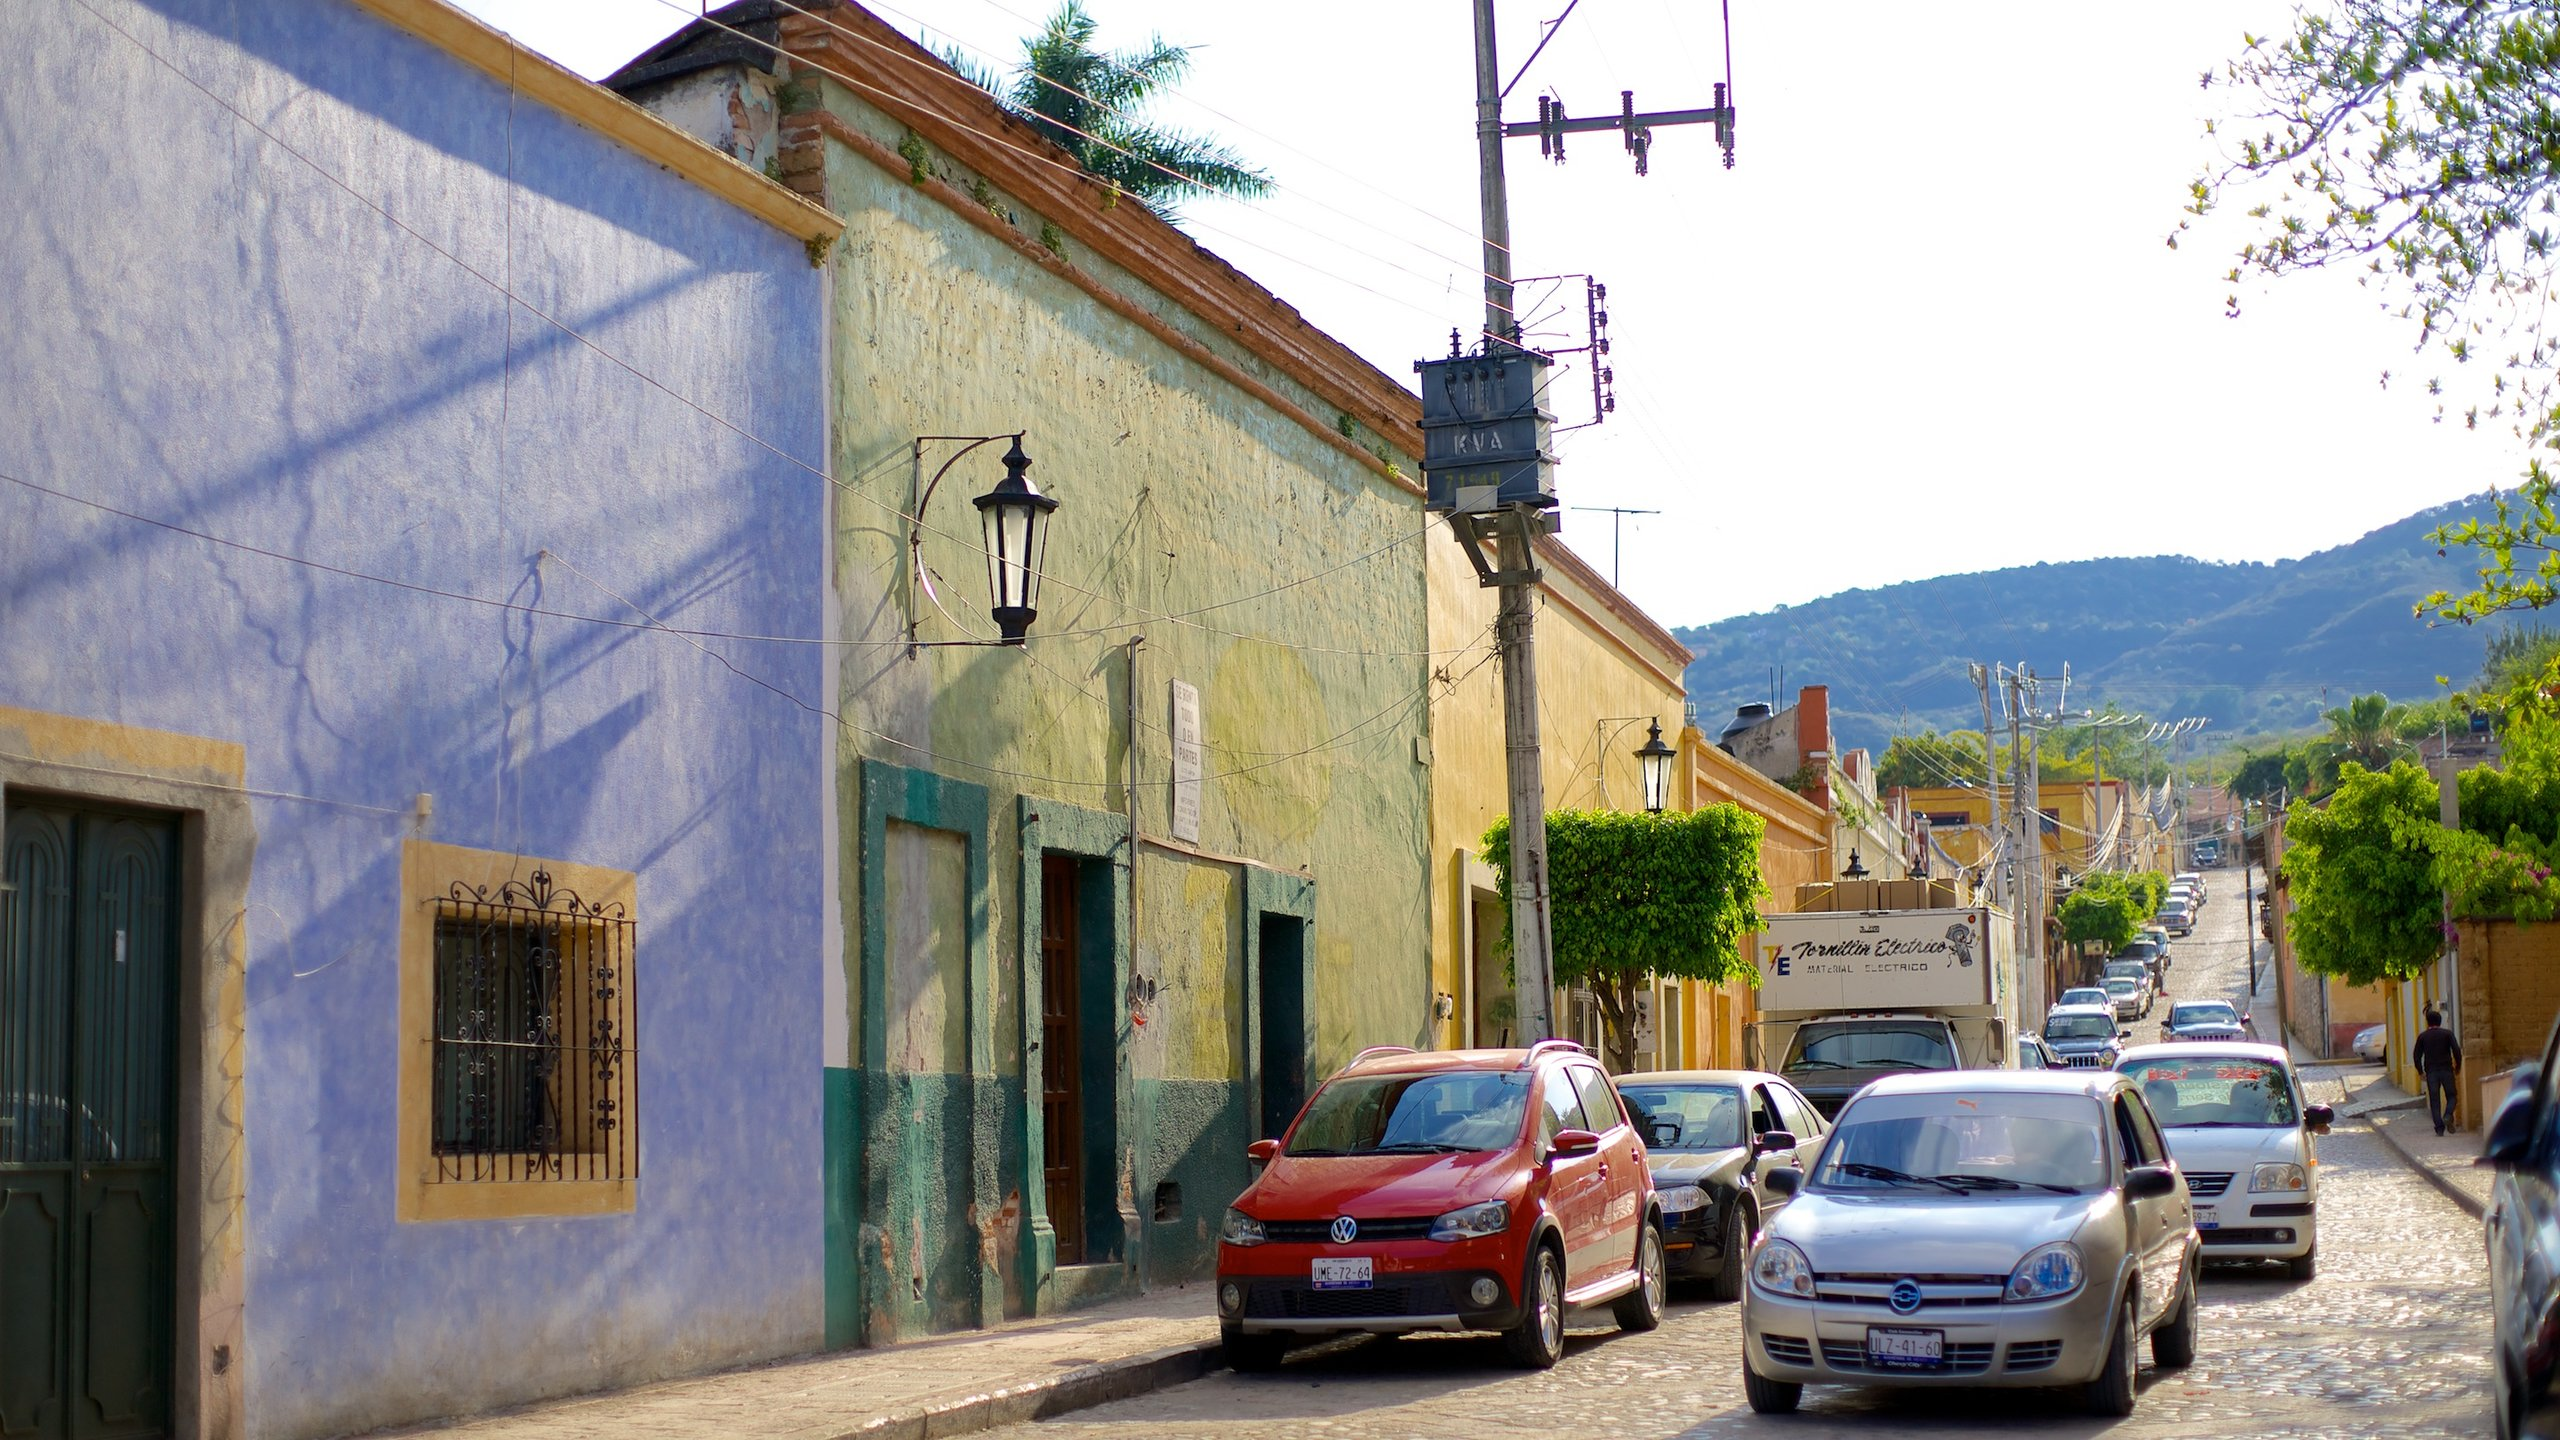 Top 10 Hotels In Jalpan De Serra From 24 Night Save